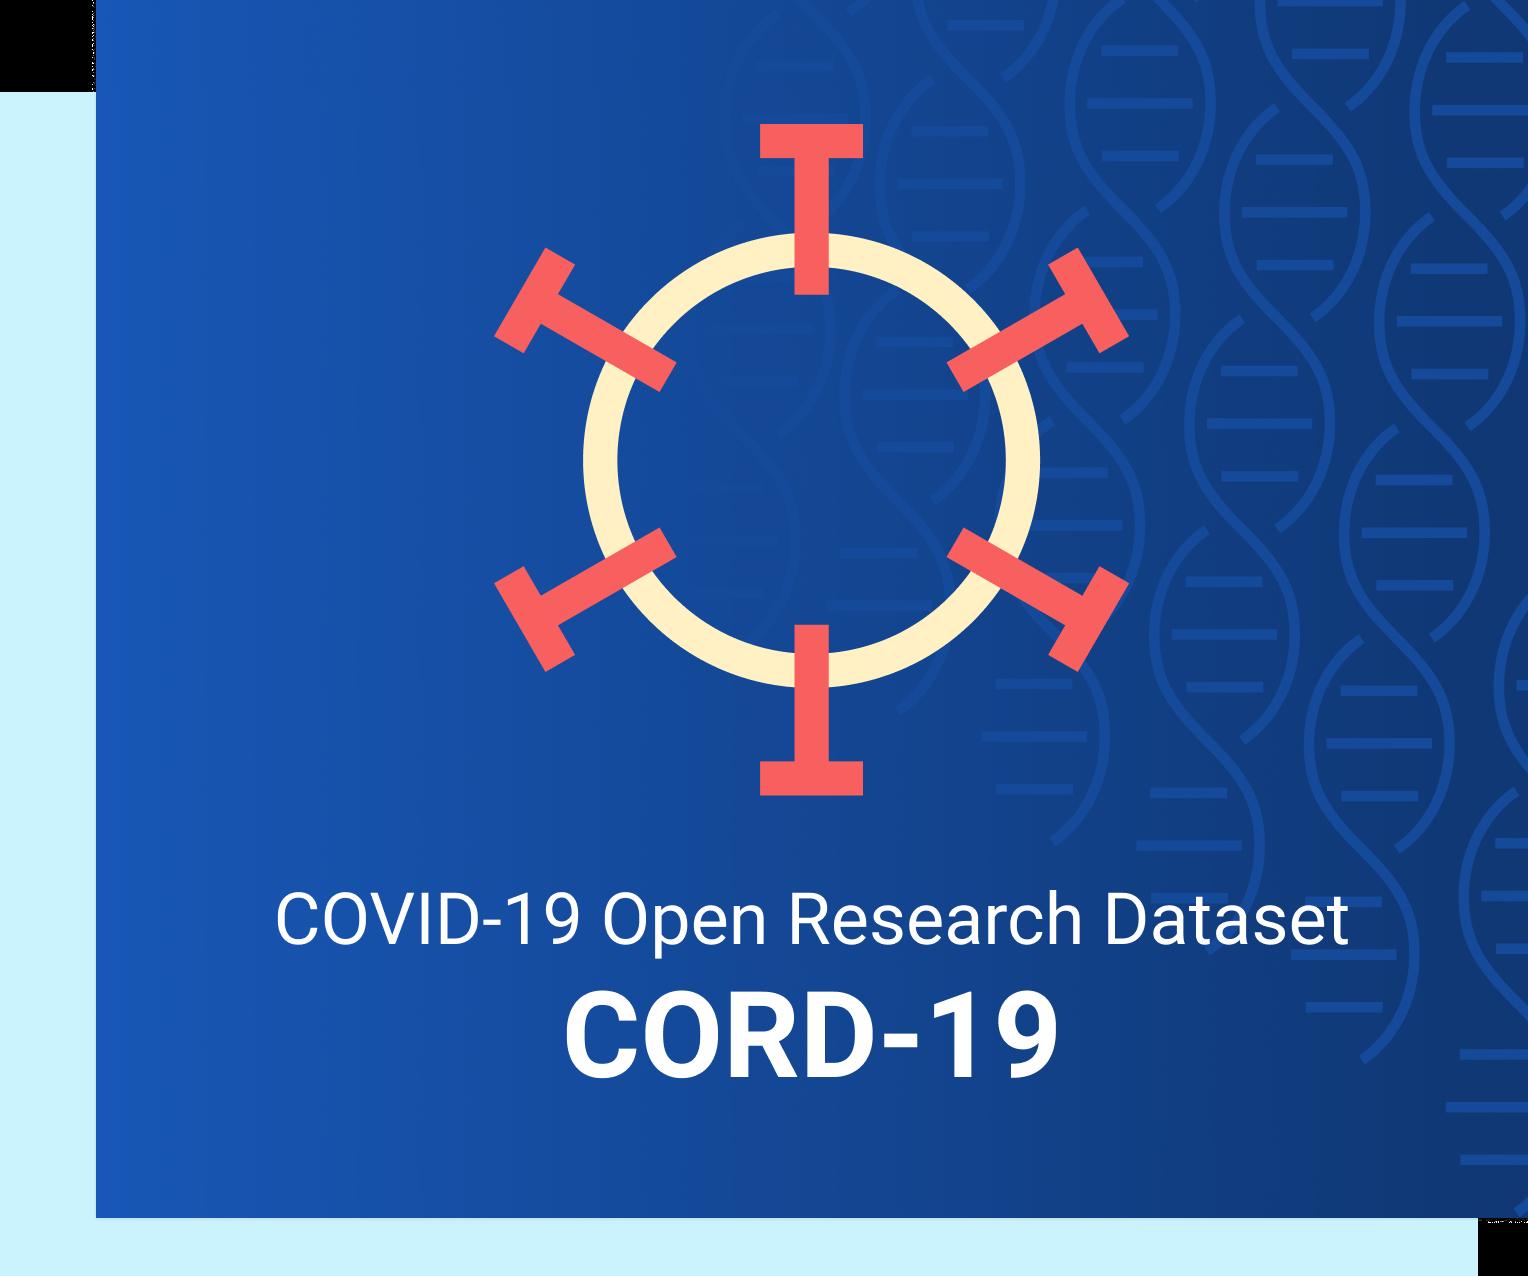 CORD-19 dataset